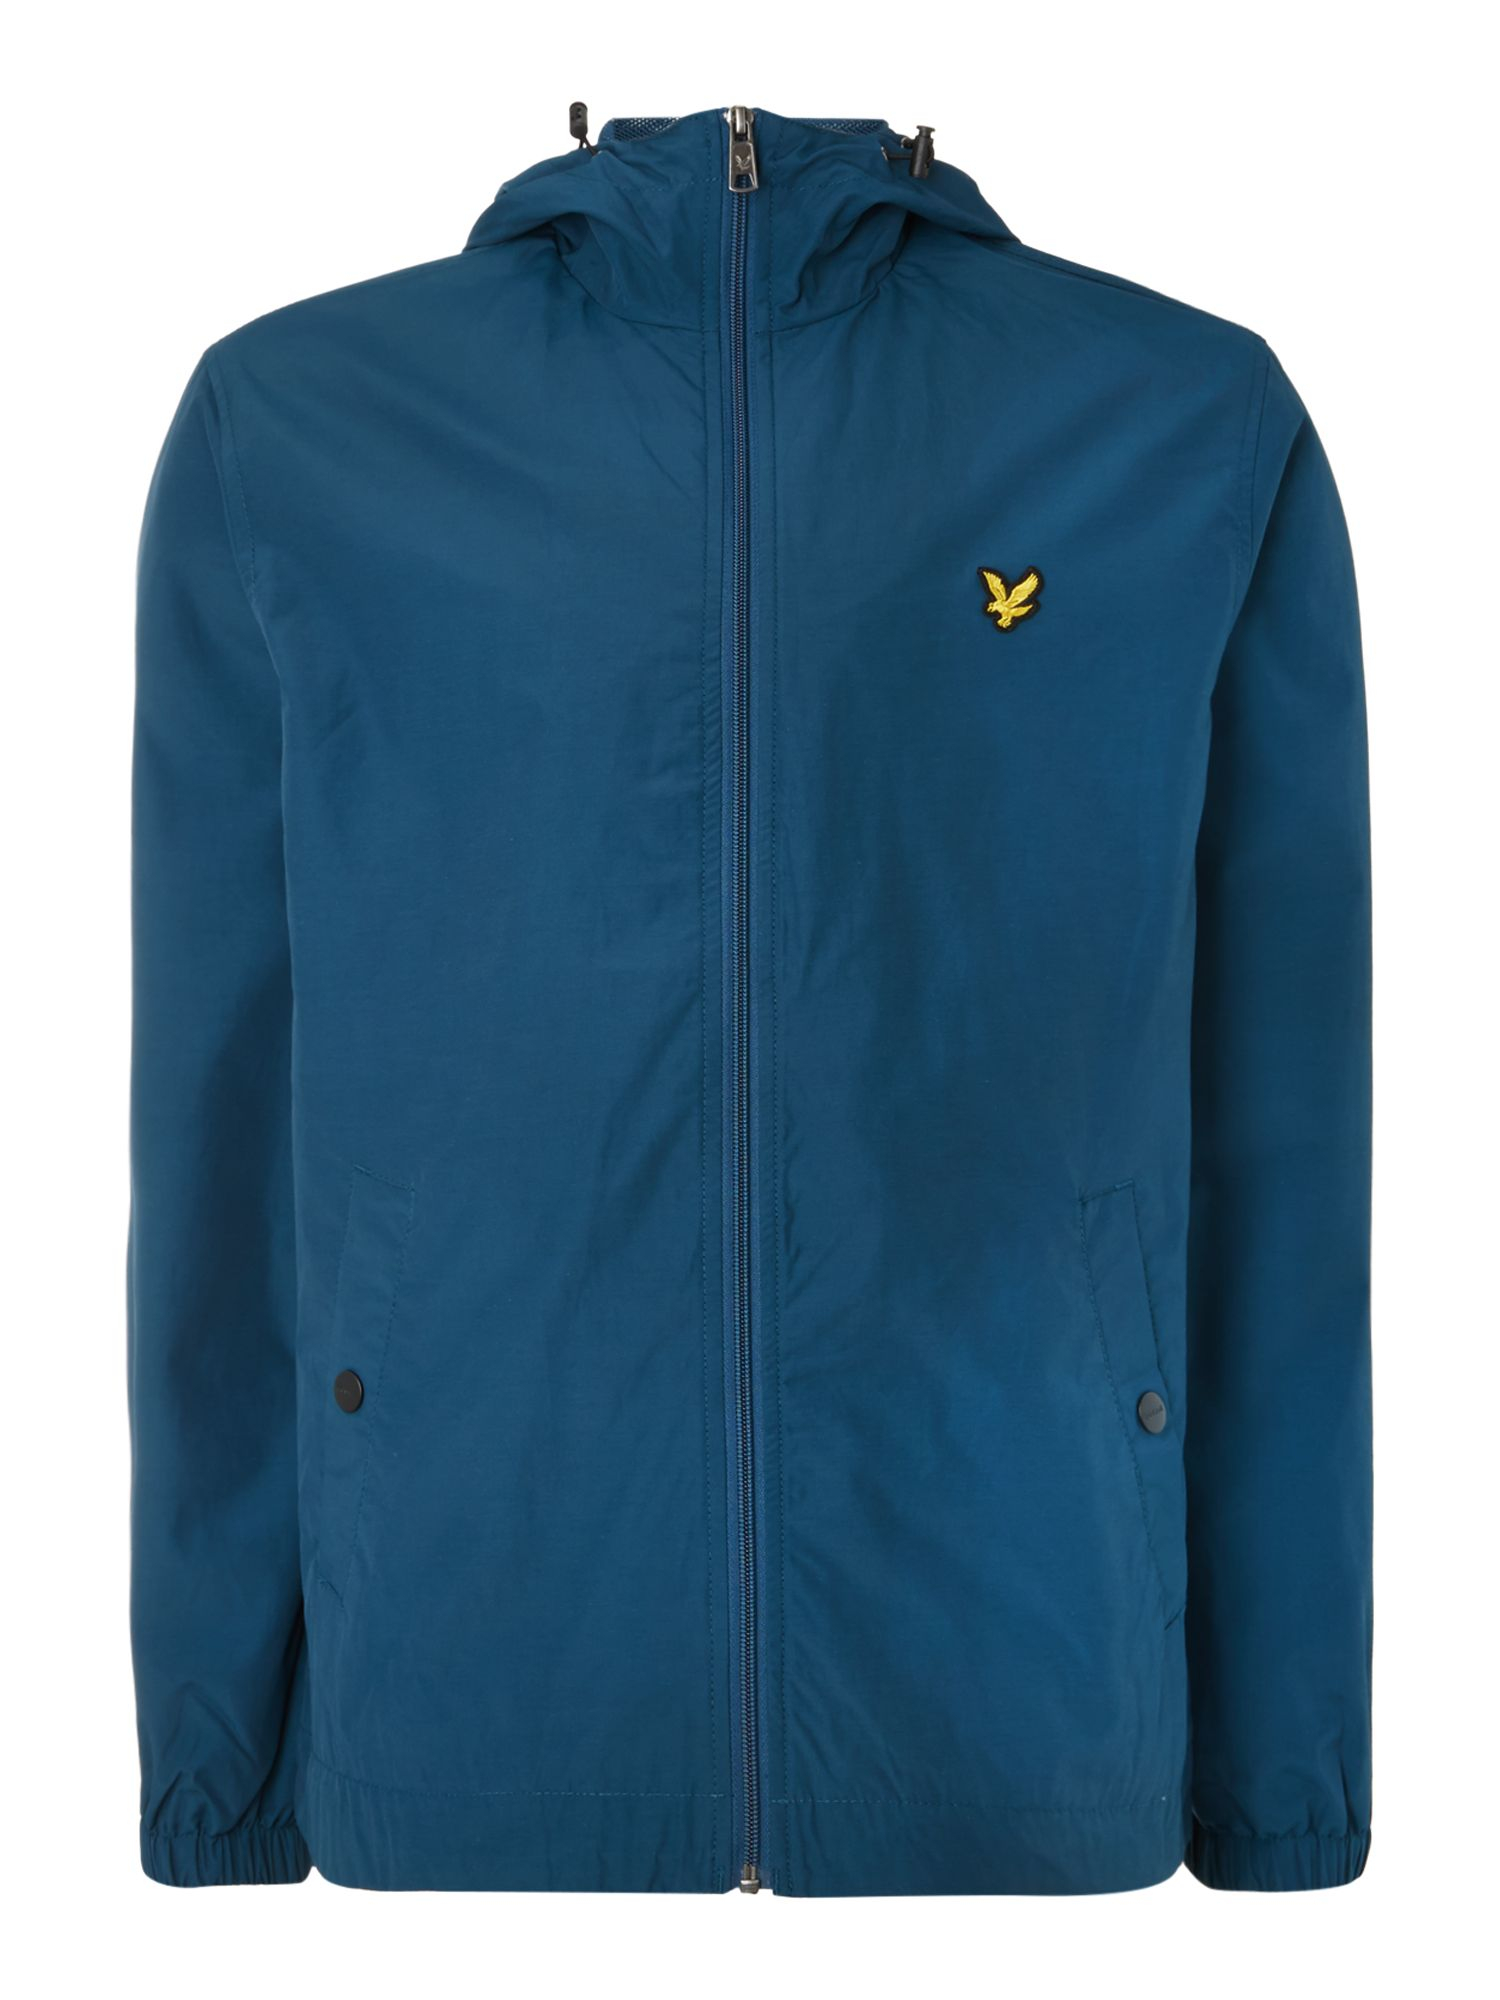 lyle scott zip through hooded jacket in blue for men lyst. Black Bedroom Furniture Sets. Home Design Ideas